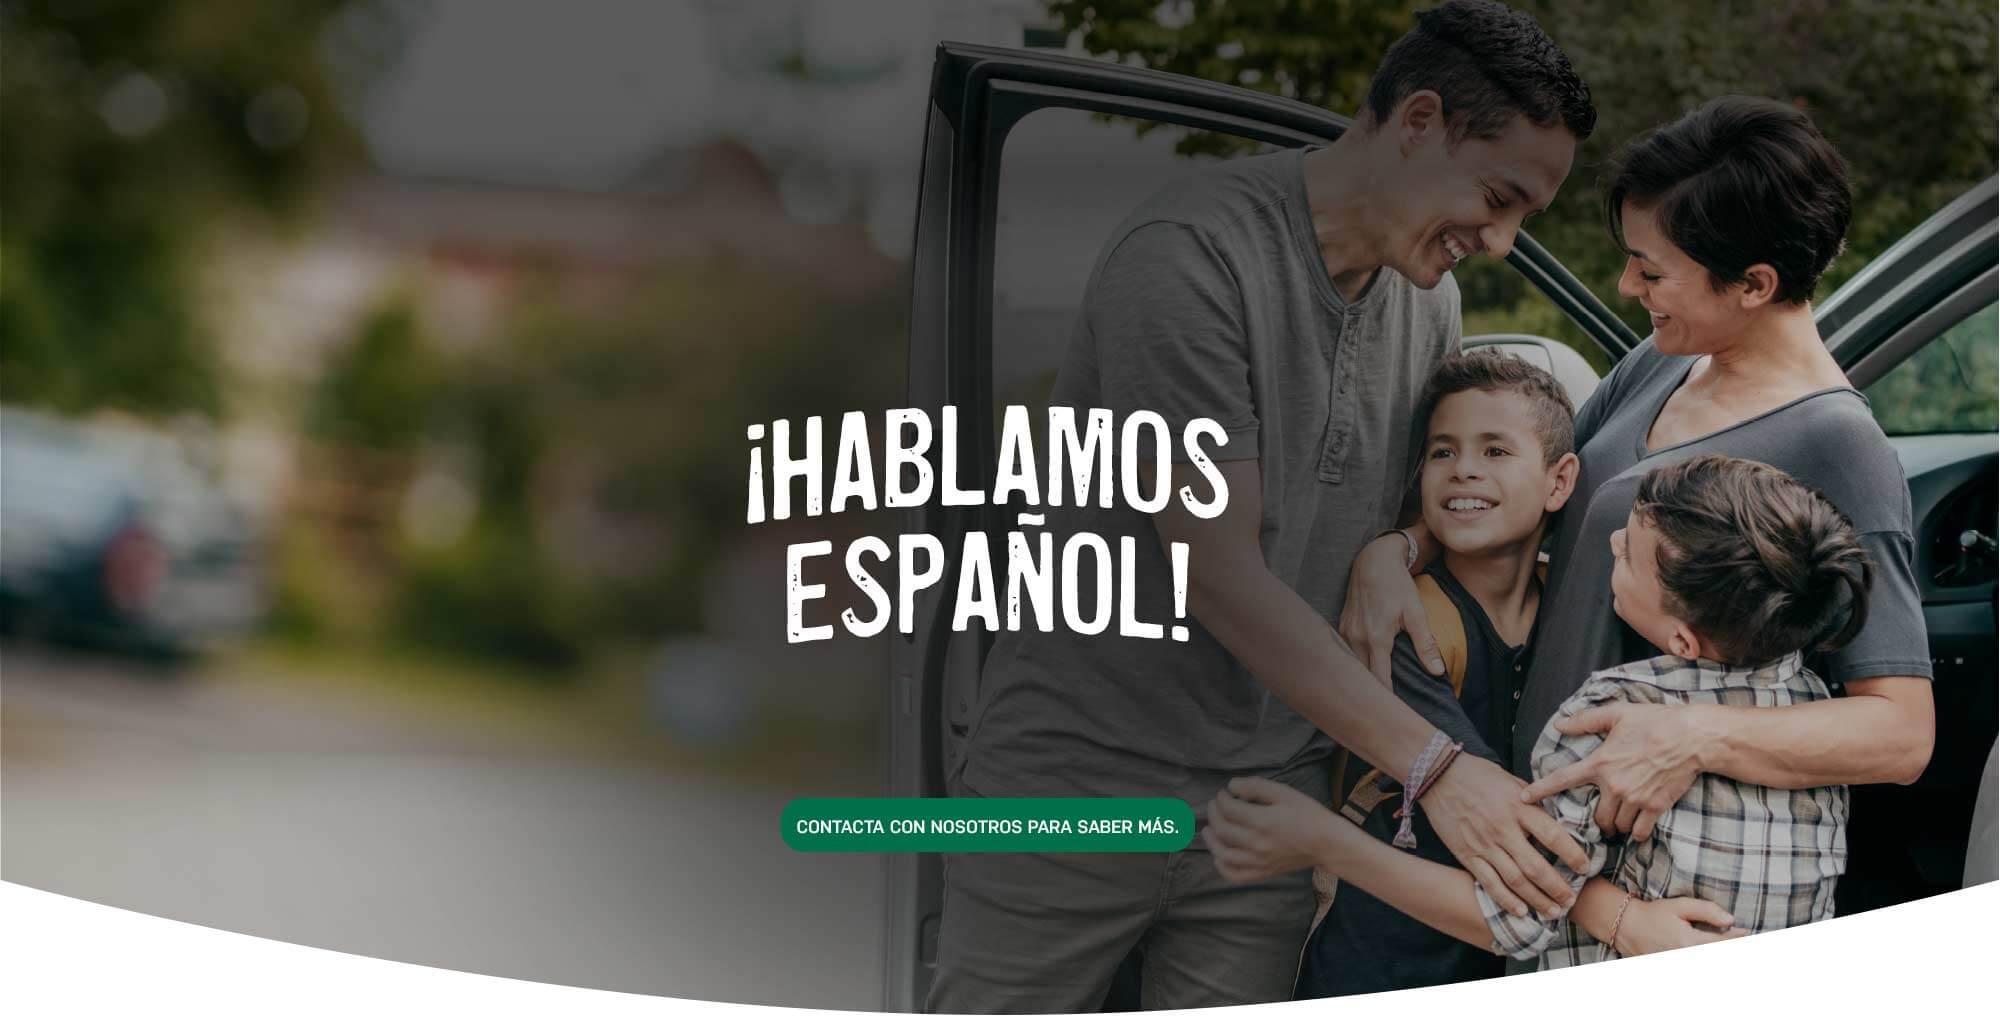 Contacta Con Nosotros Para Saber Mas.